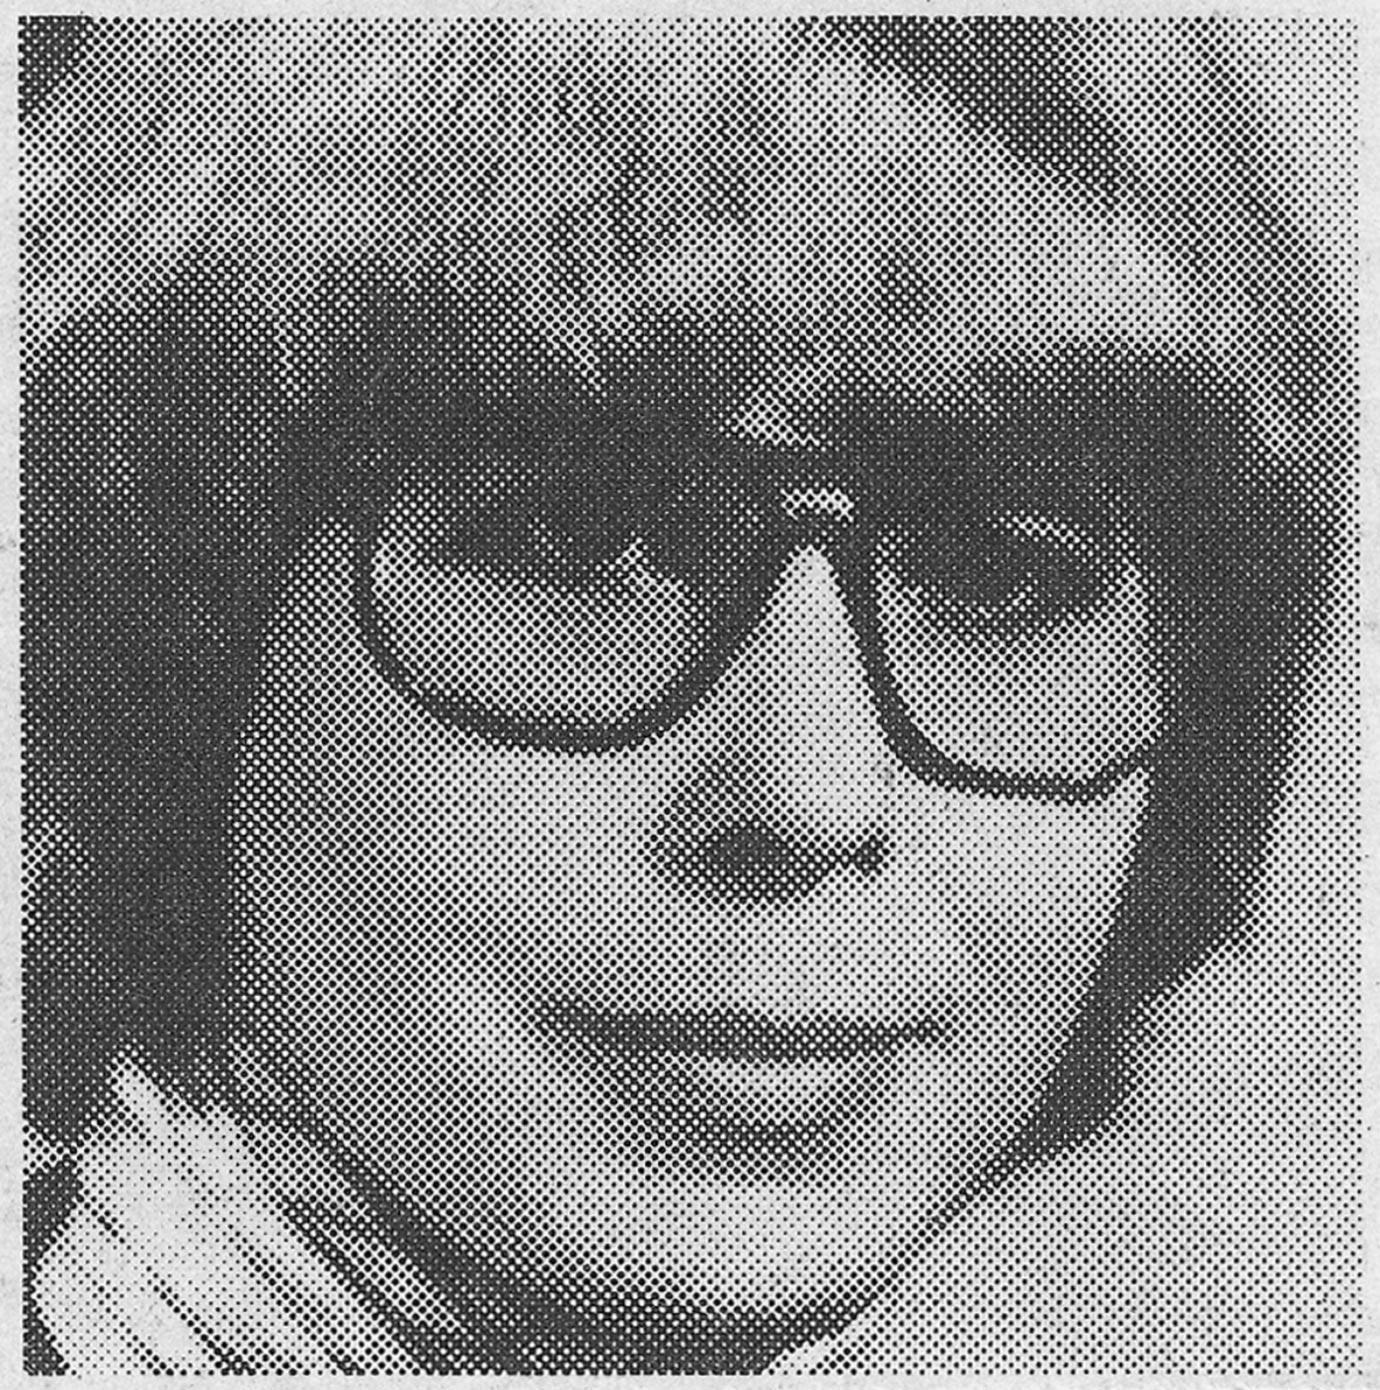 Thomas Ruff, Zeitungsfoto 153, 1991